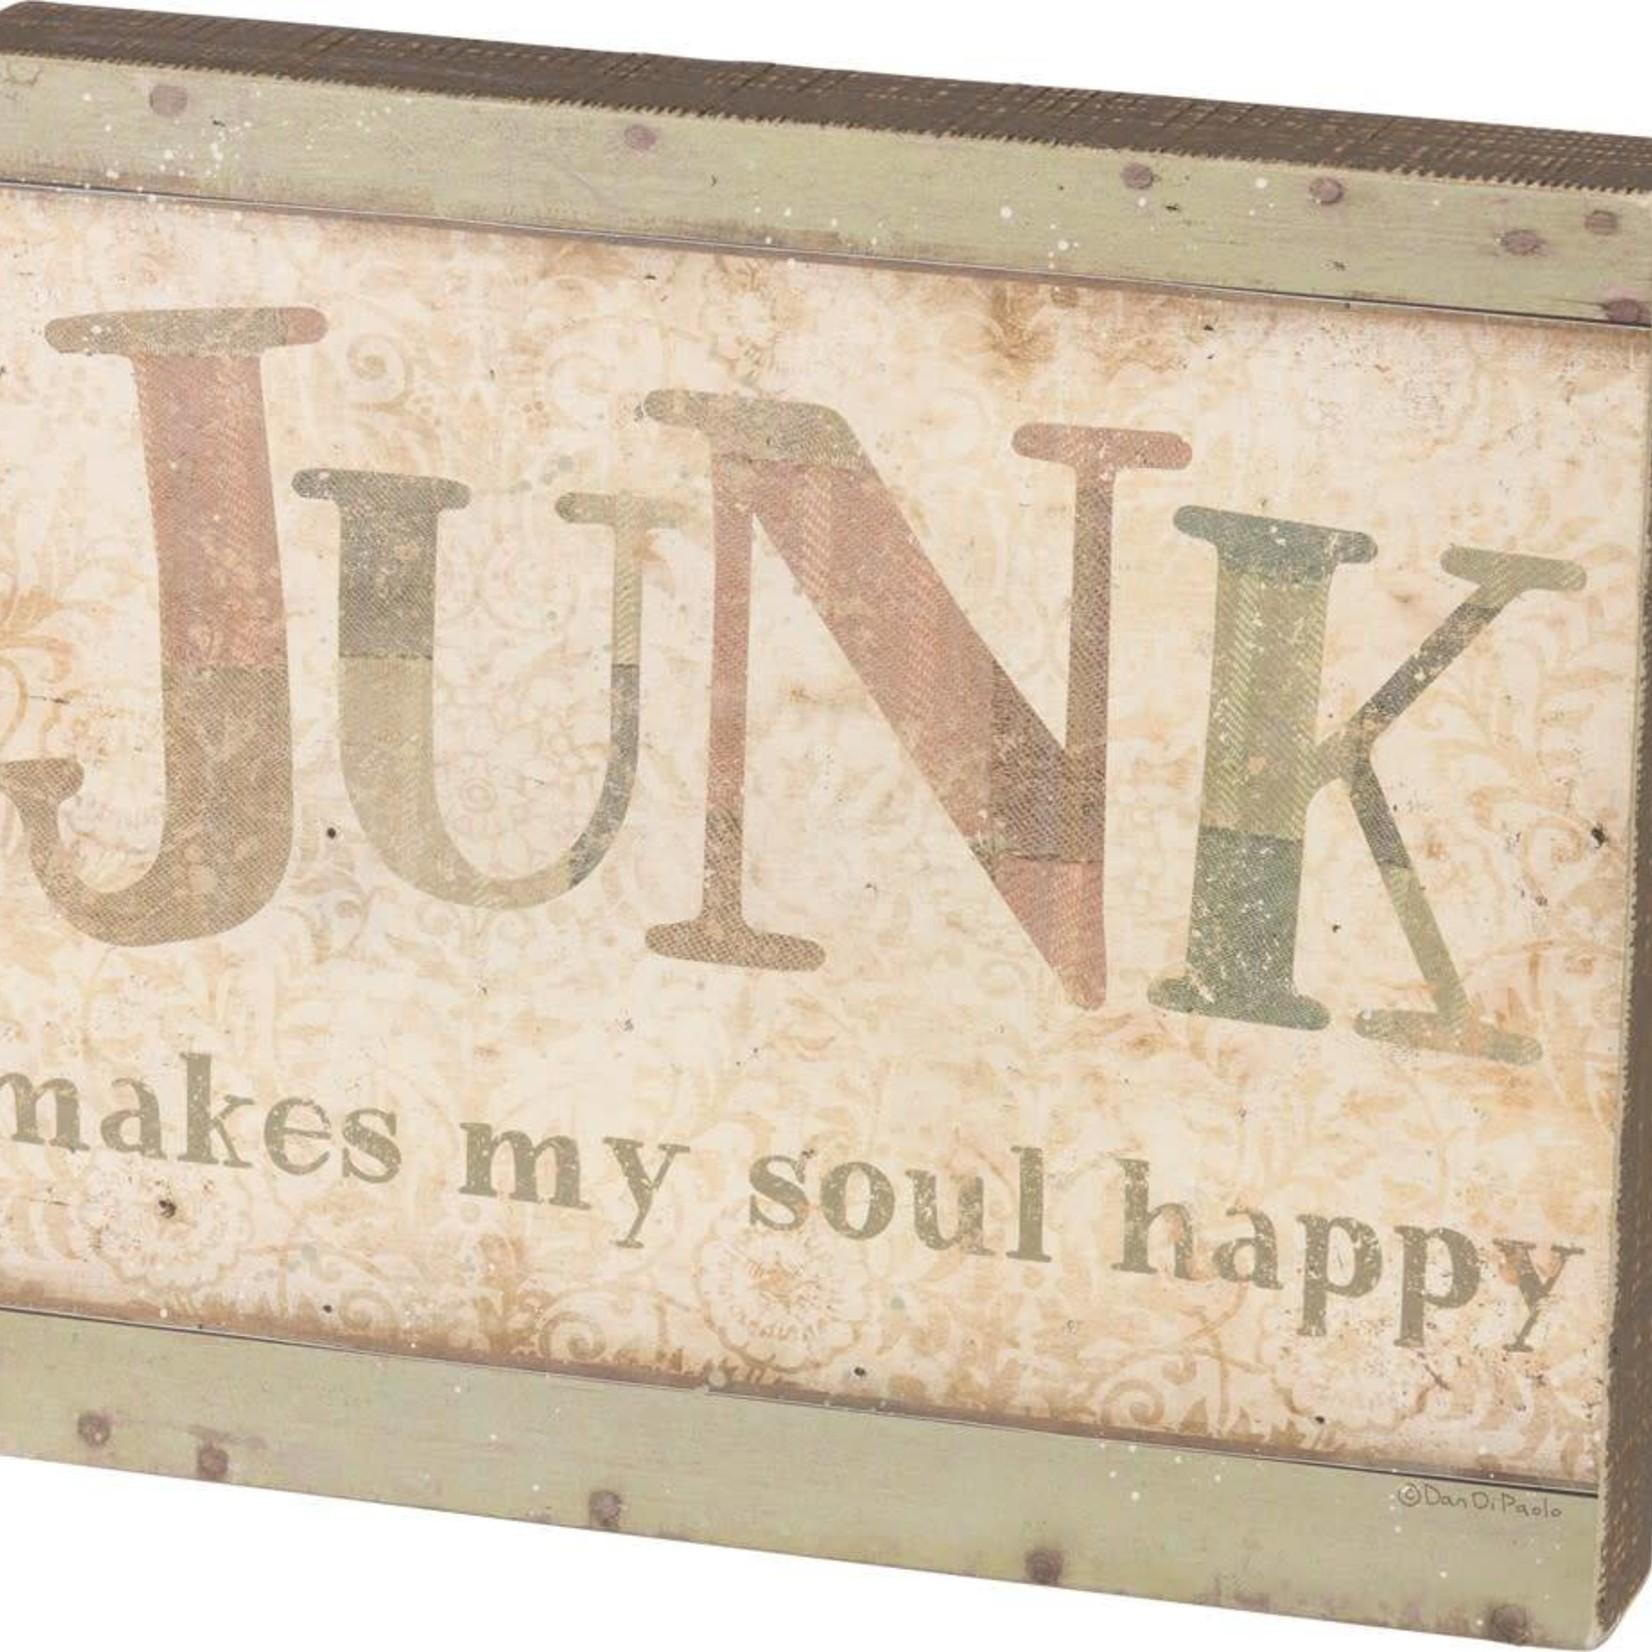 Junk Makes My Soul Happy 100270